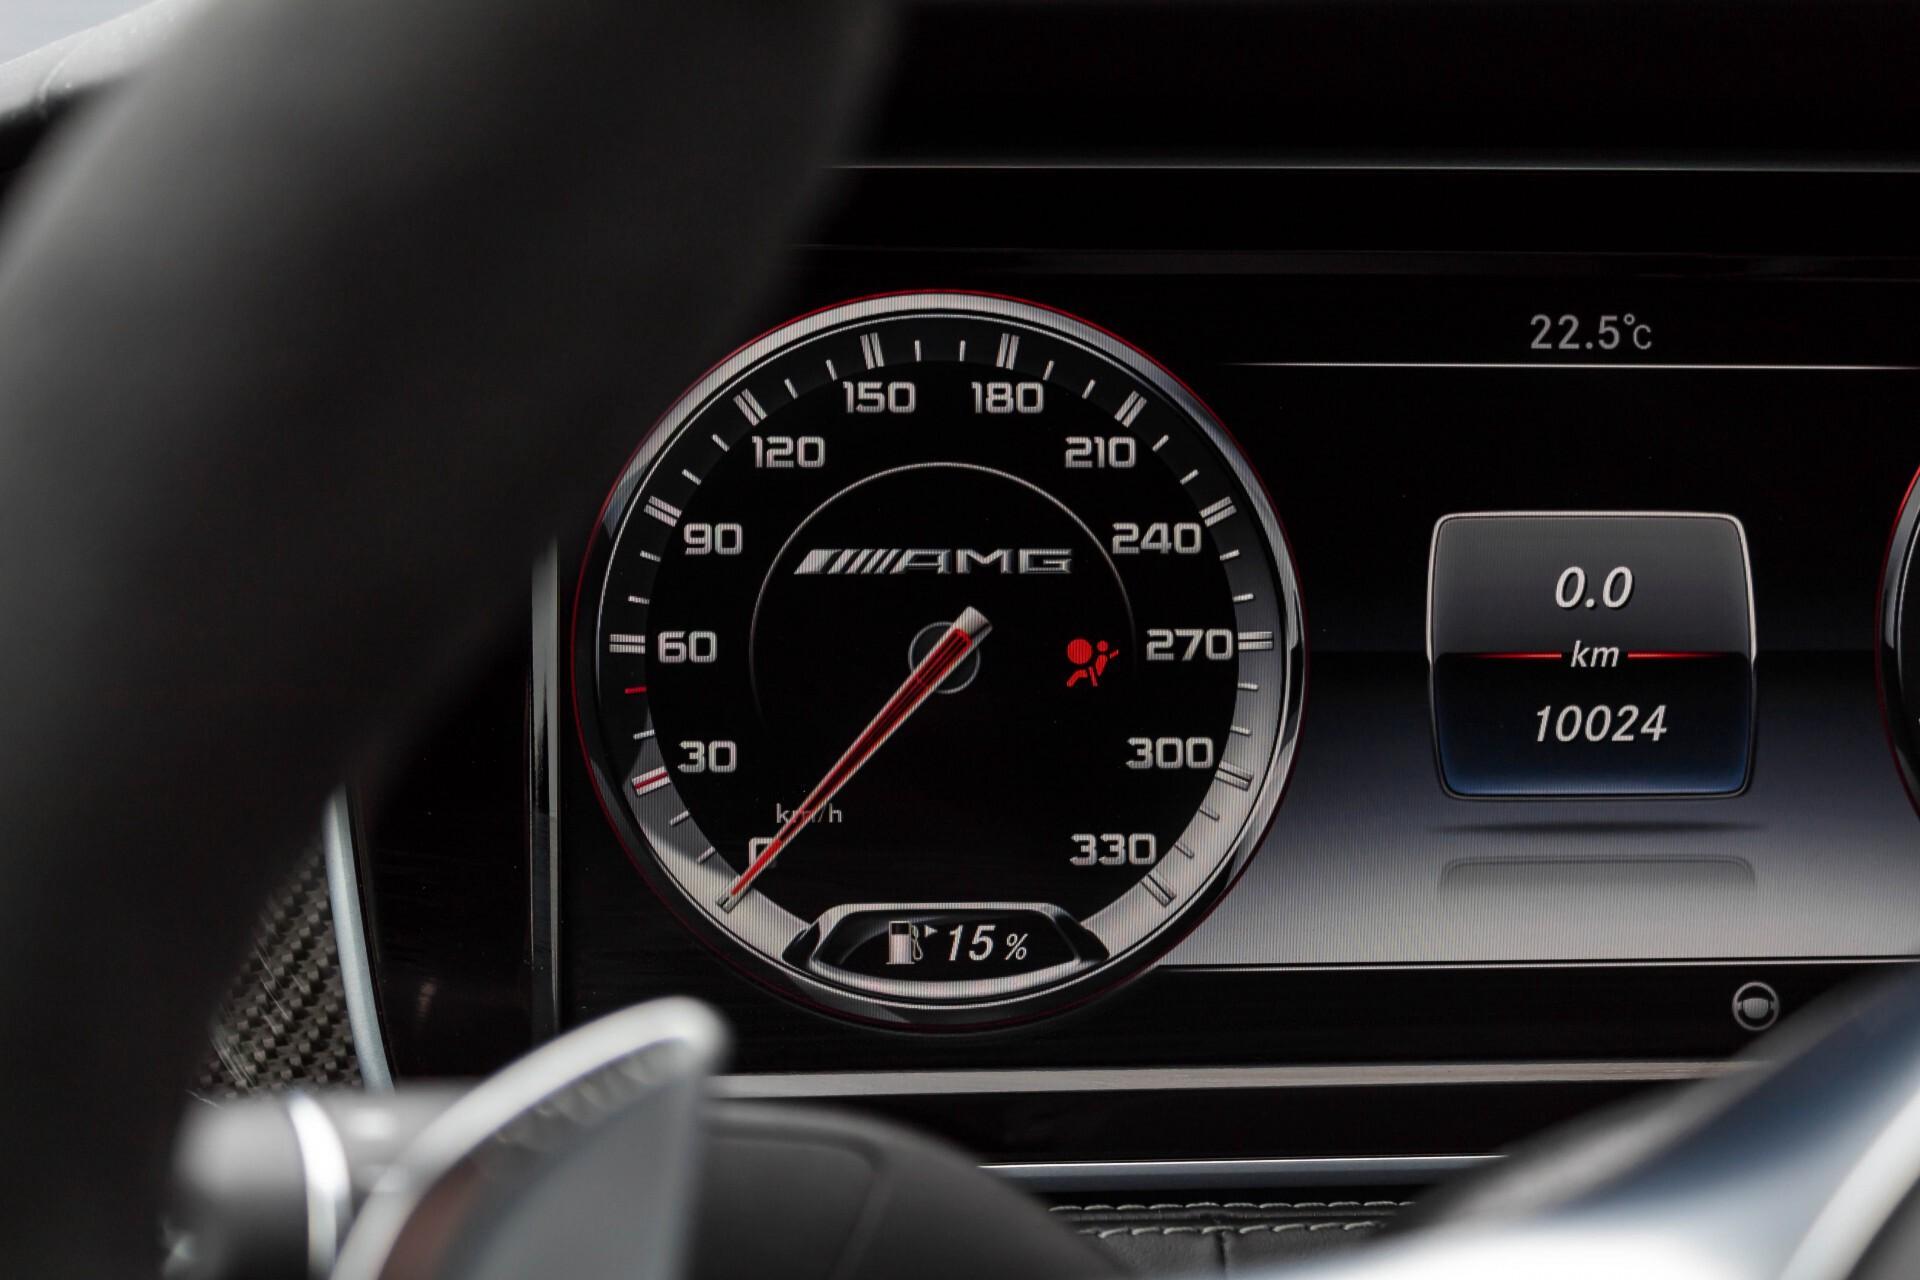 Mercedes-Benz S-Klasse Cabrio 63 AMG 4-M Ceramic/Designo/Carbon/Burmester High End Aut Foto 22